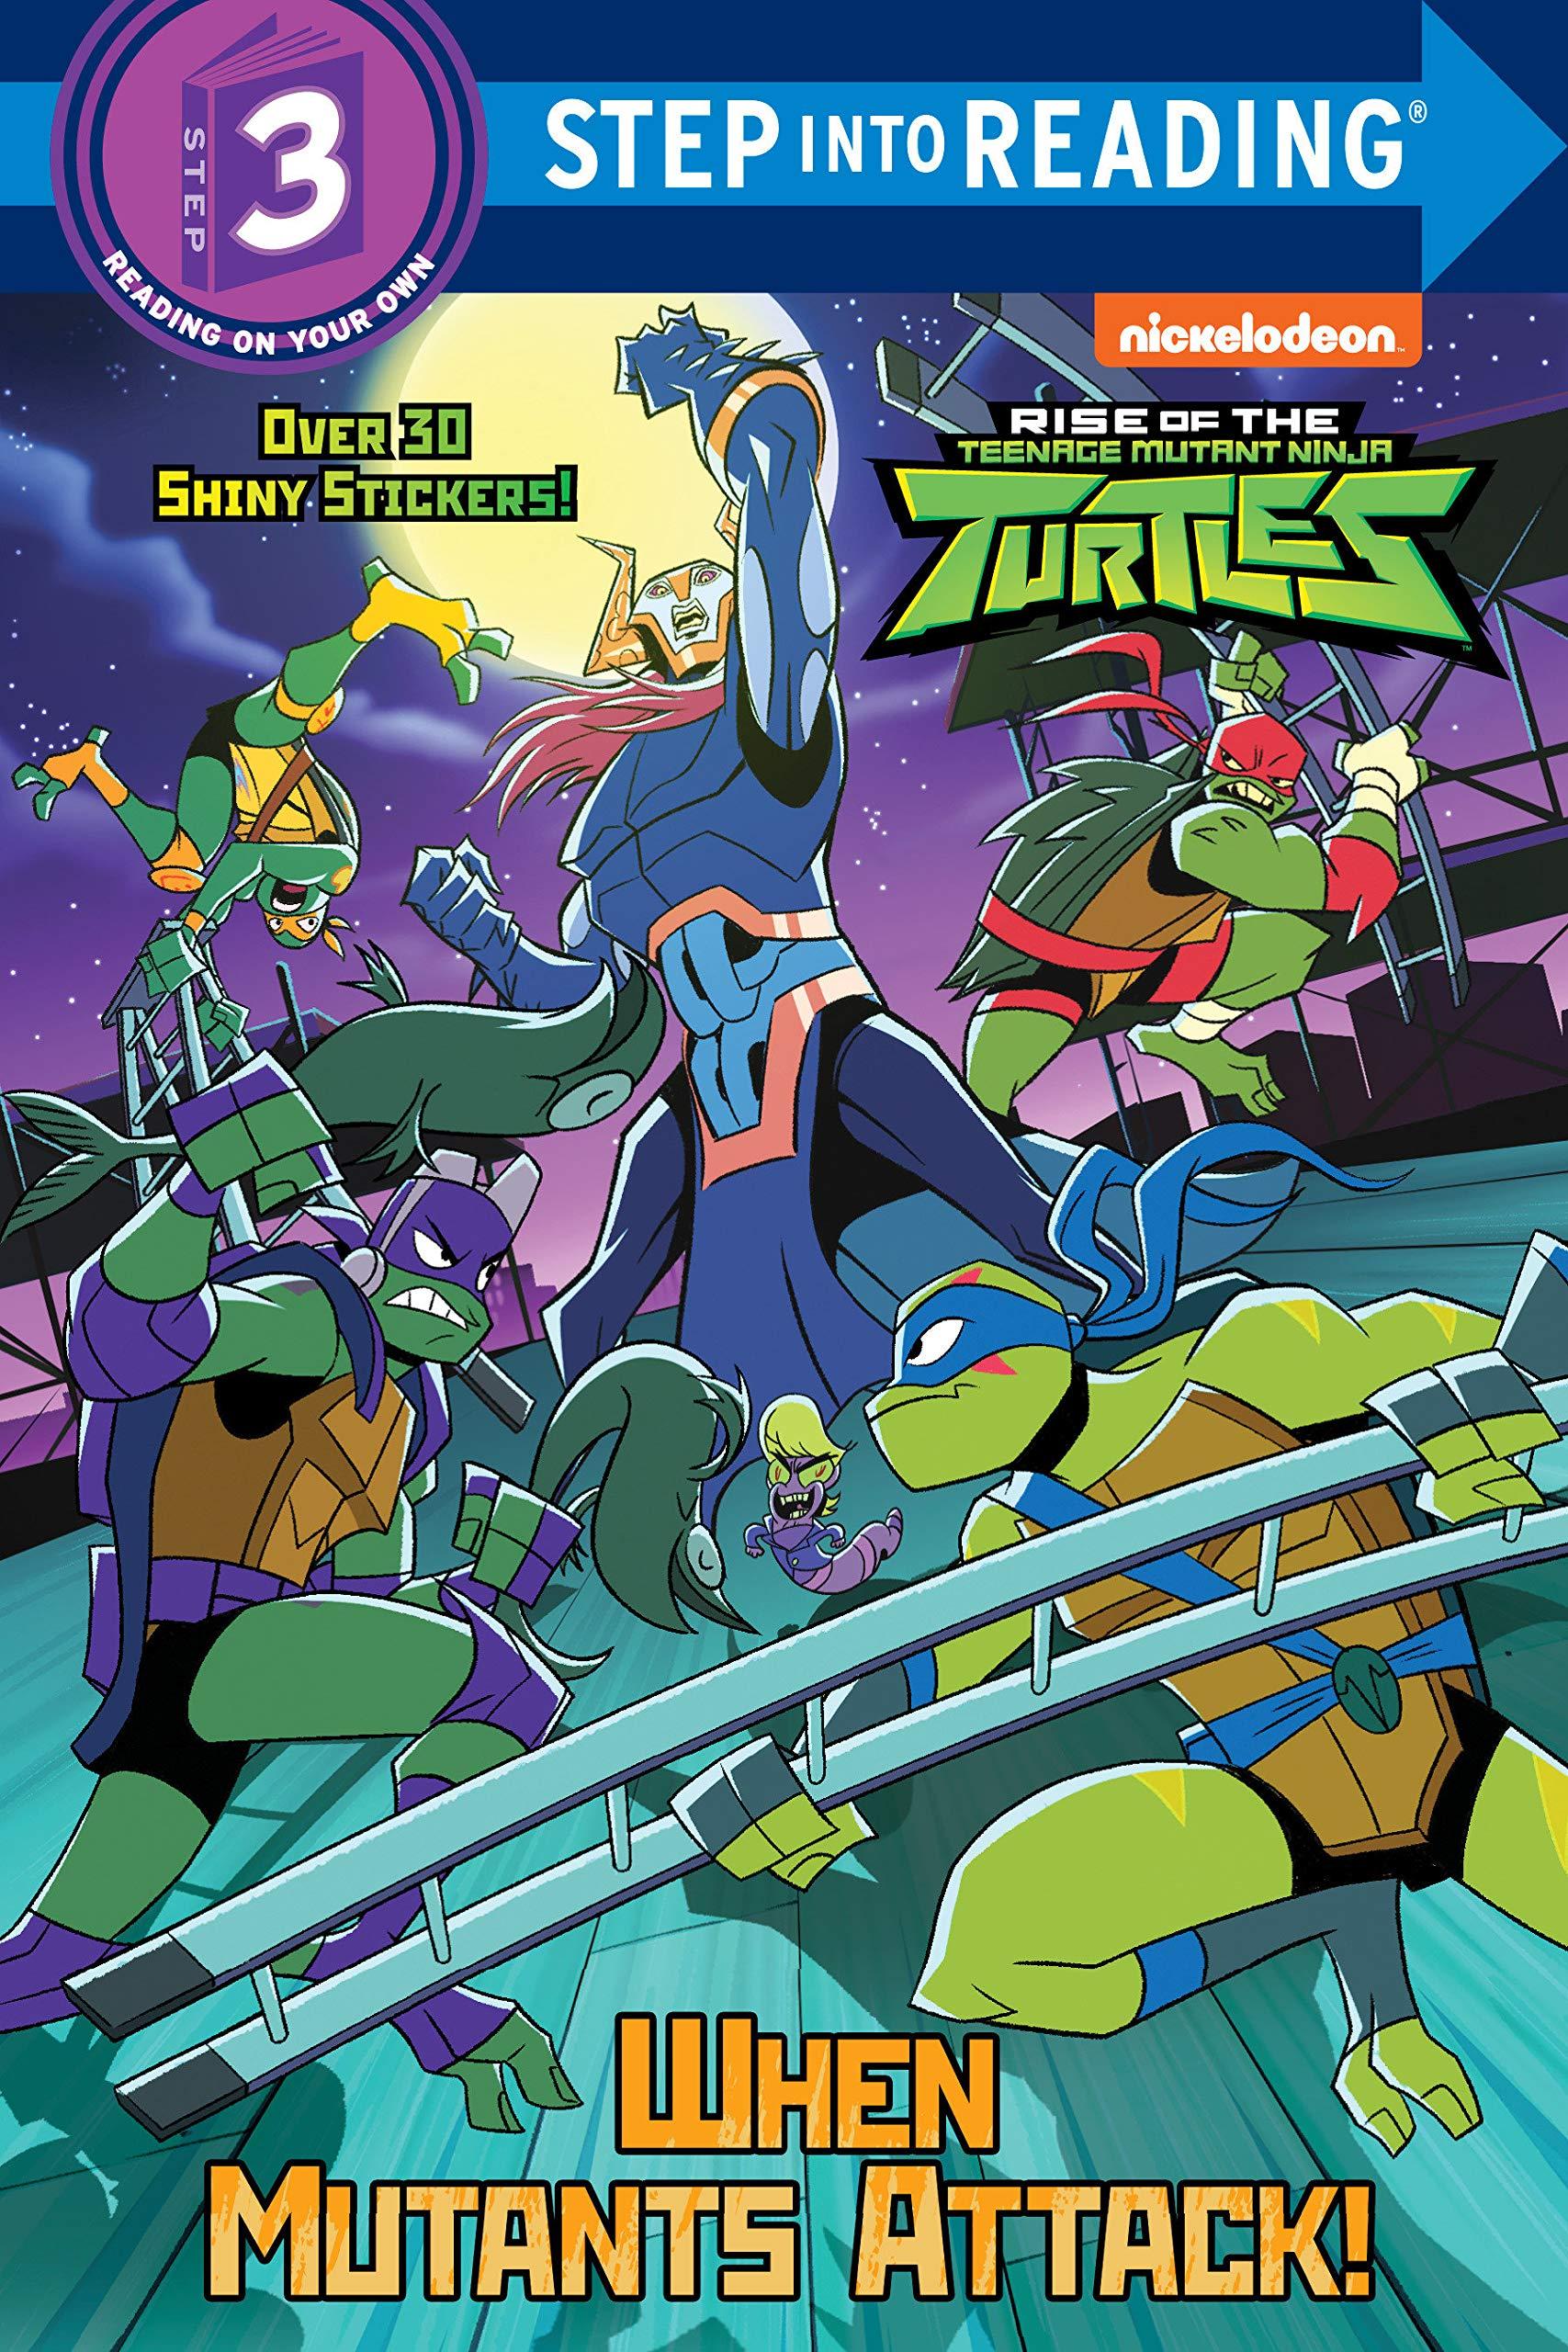 When Mutants Attack! Rise of the Teenage Mutant Ninja ...